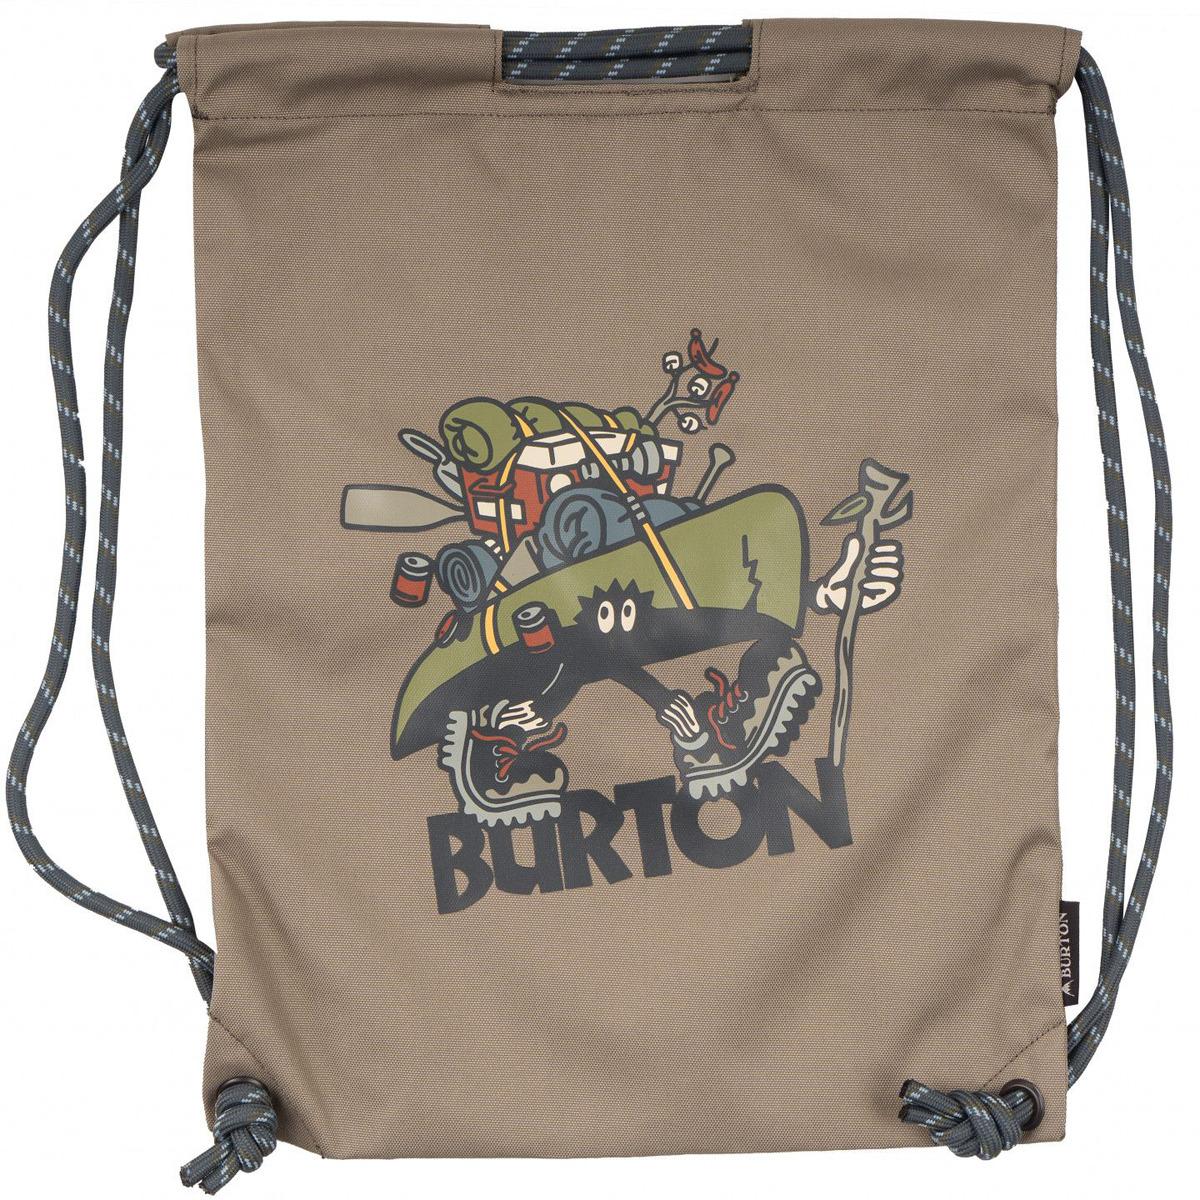 Рюкзак Burton Cinch Bag, 16697106250NA, бежевый, 13 л burton рюкзак cadet pack syrup herringbone win14